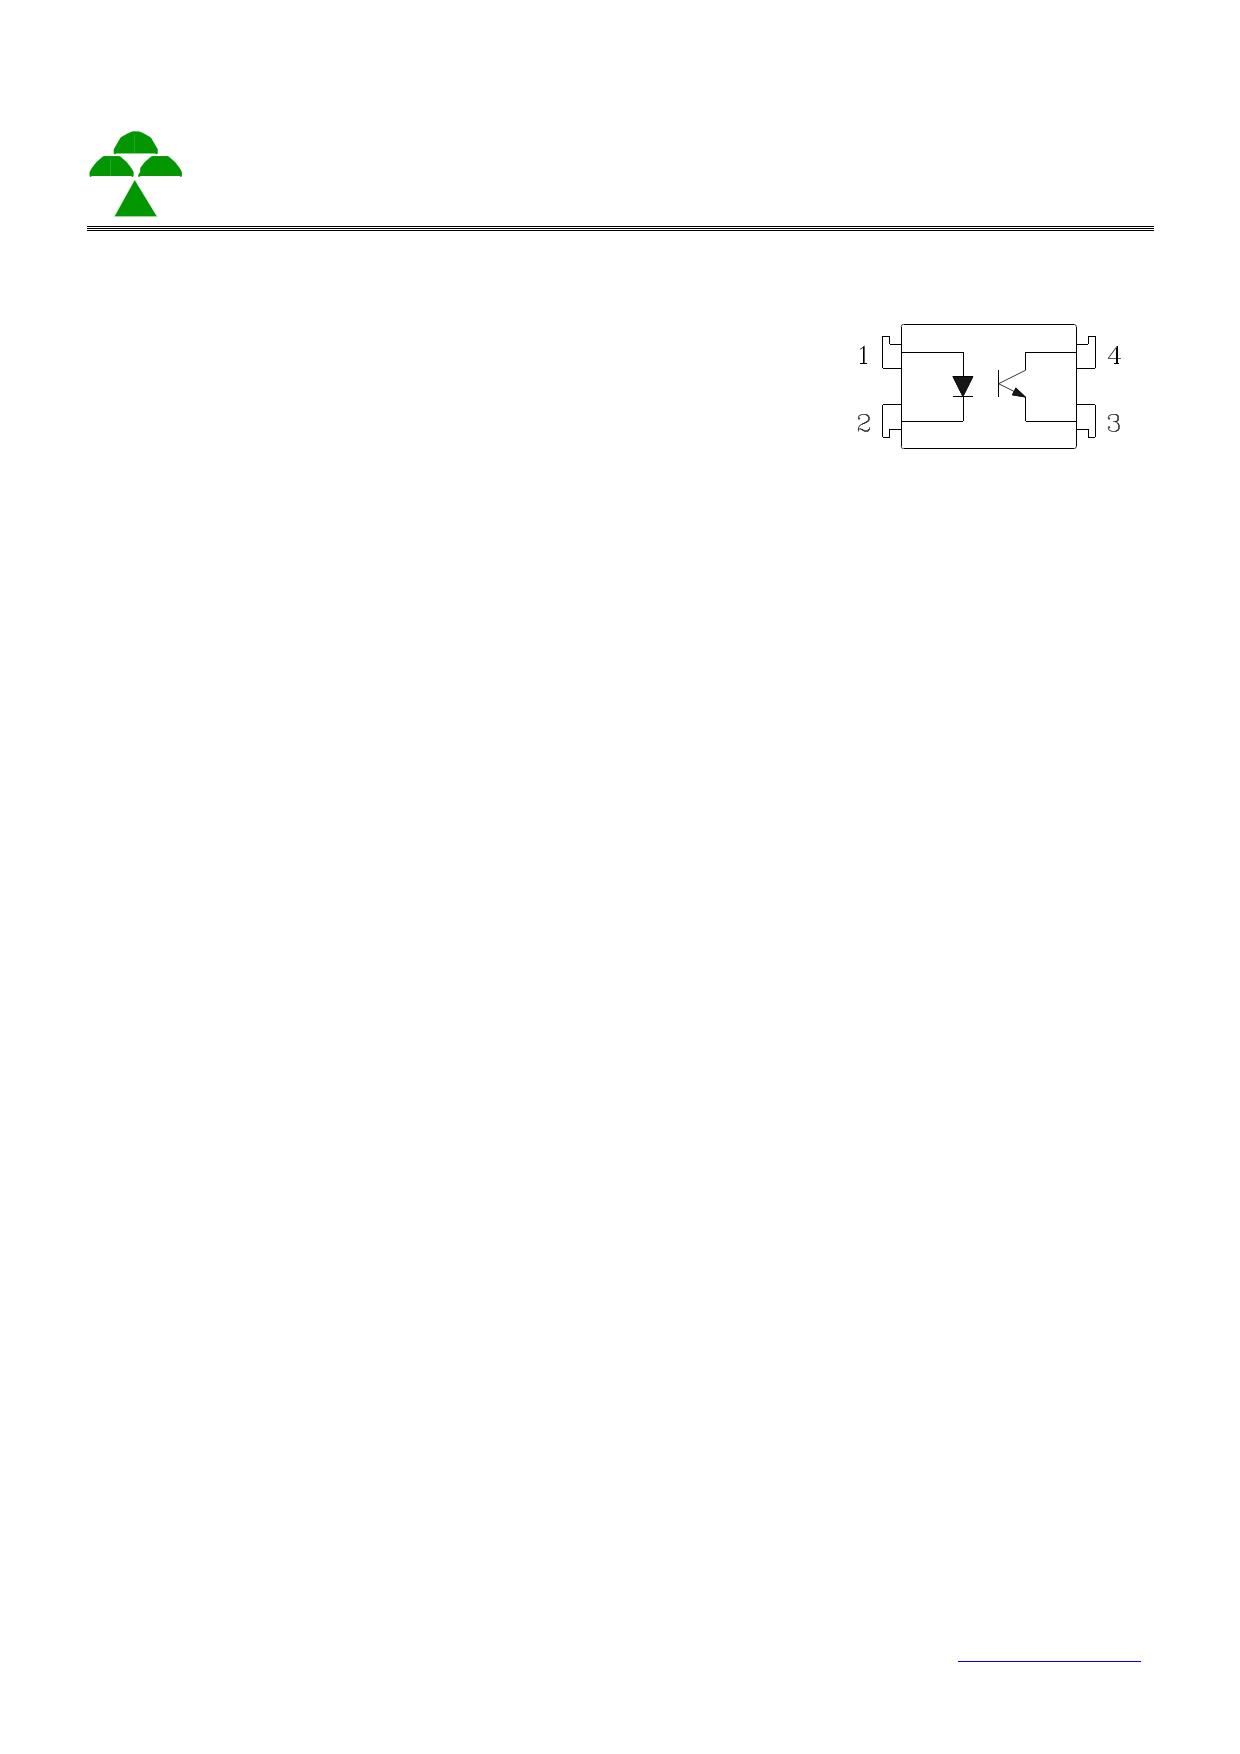 K1010 Даташит, Описание, Даташиты